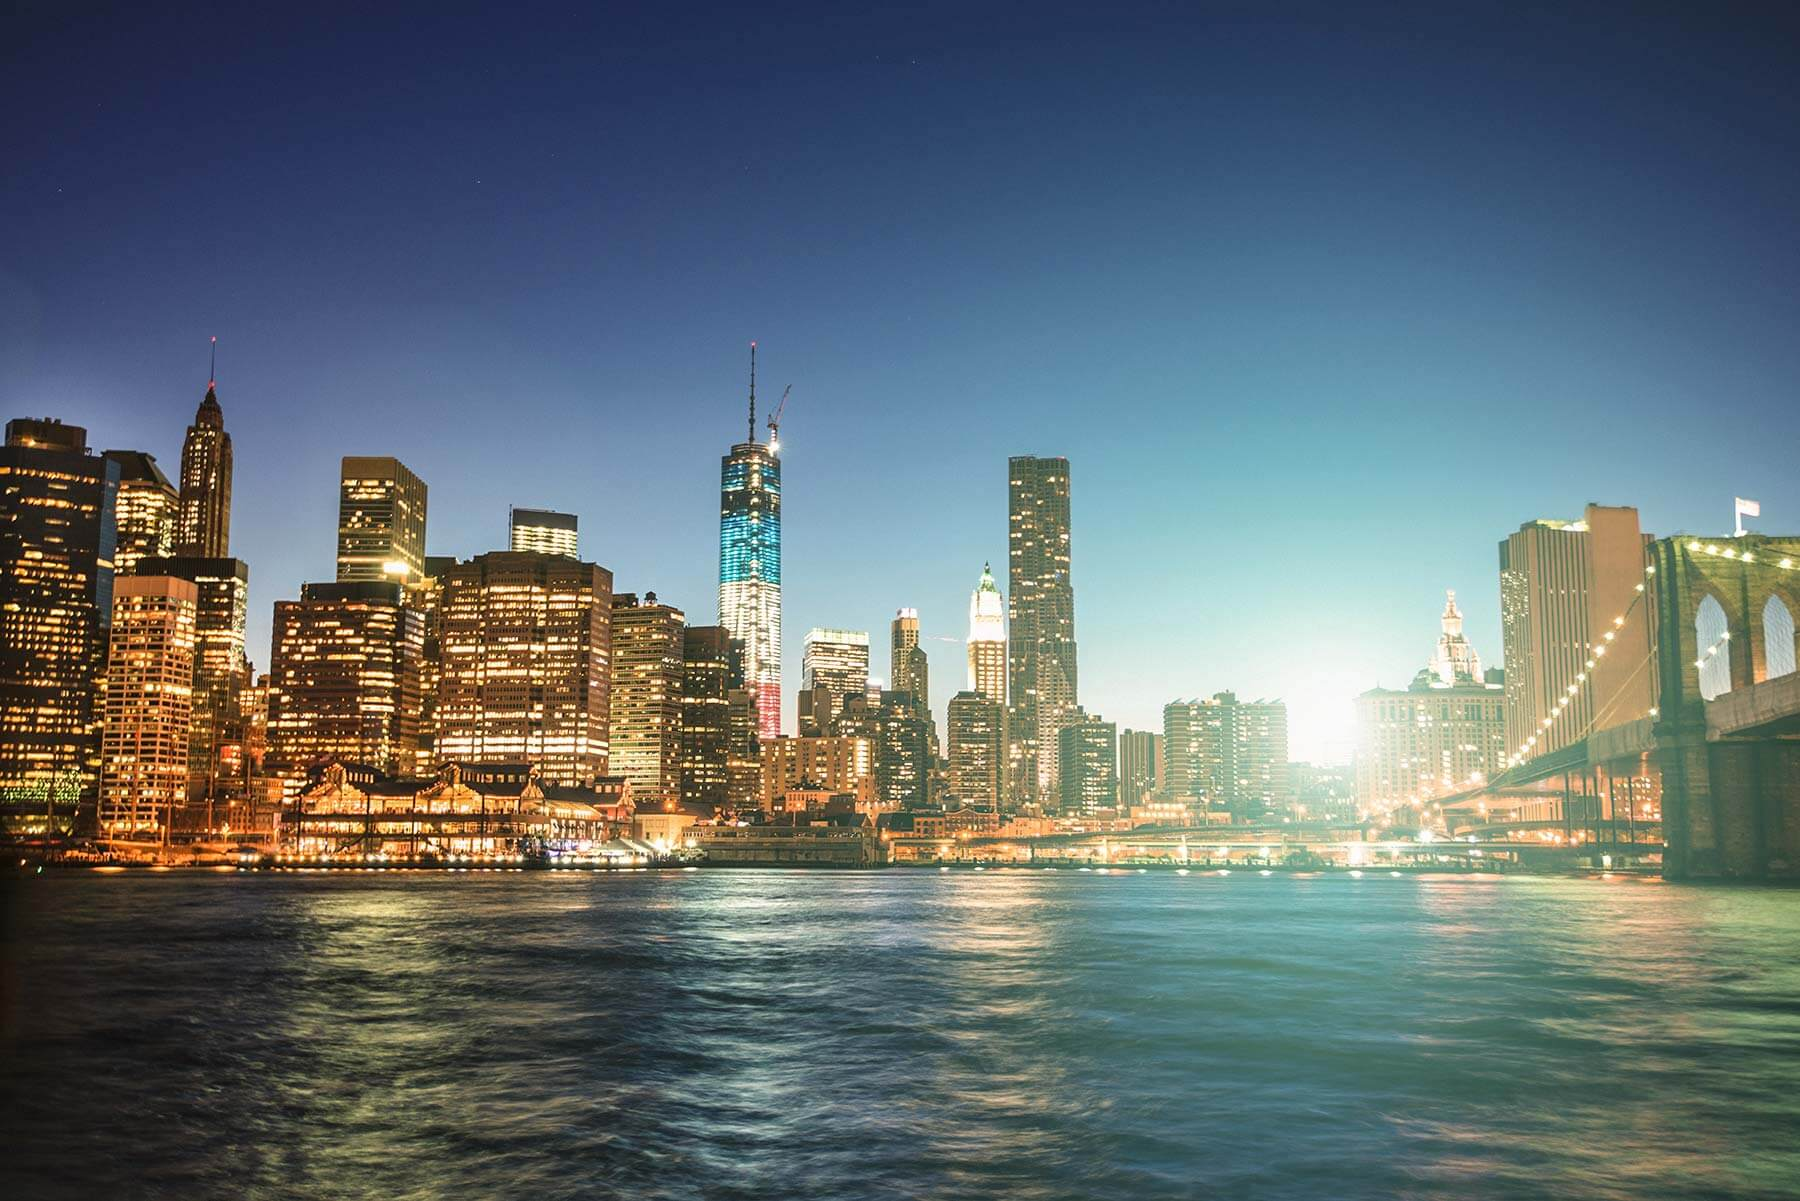 Skyline photo of Manhattan, NY